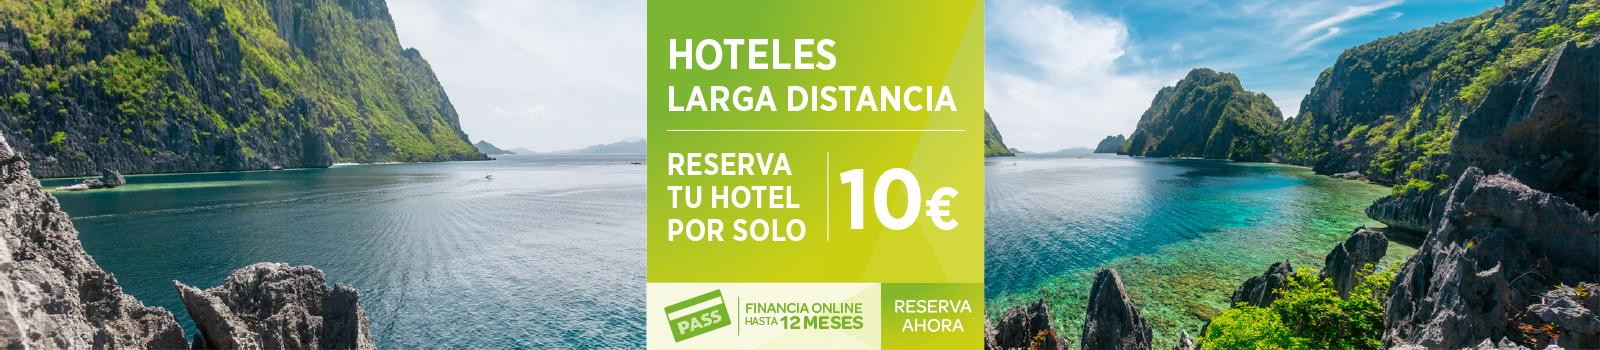 Oferta Hoteles Larga Distancia